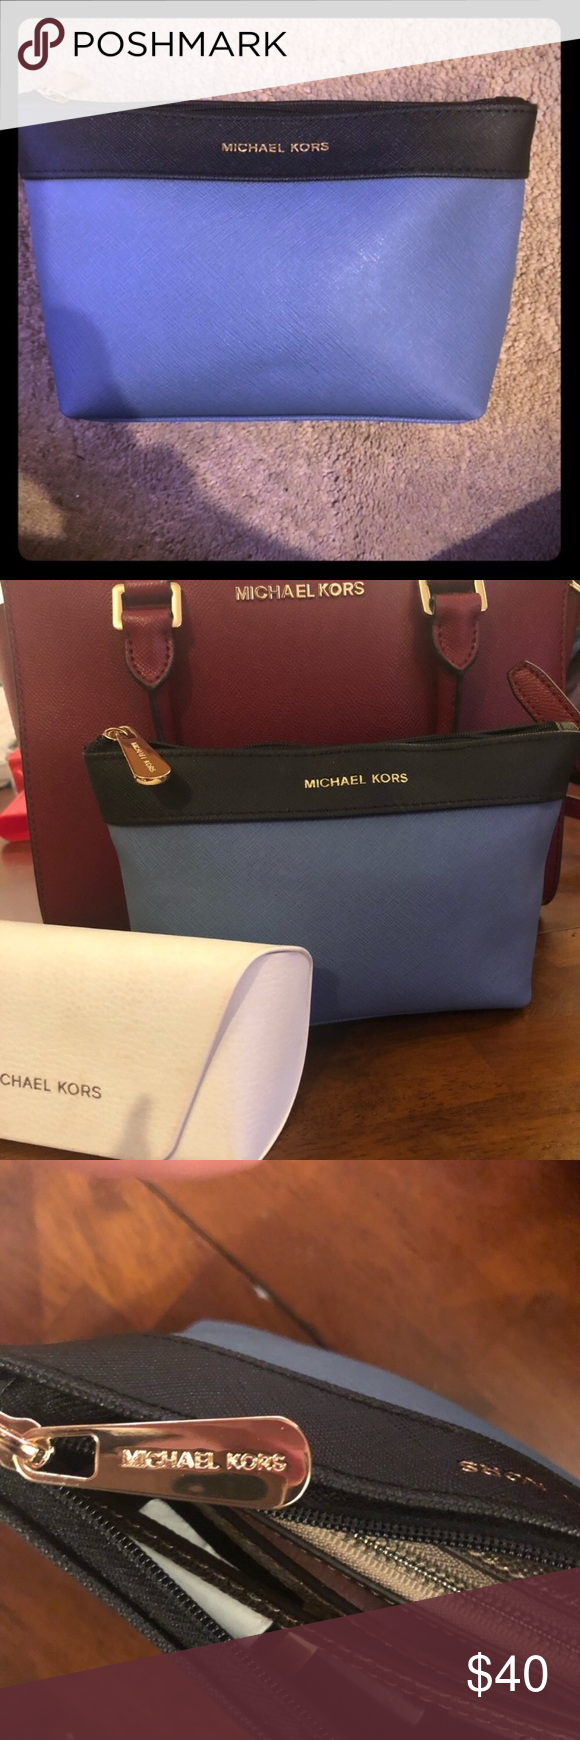 Michael Kors Makeup Bag/Clutch! New In Package!! 6.5''/4.5